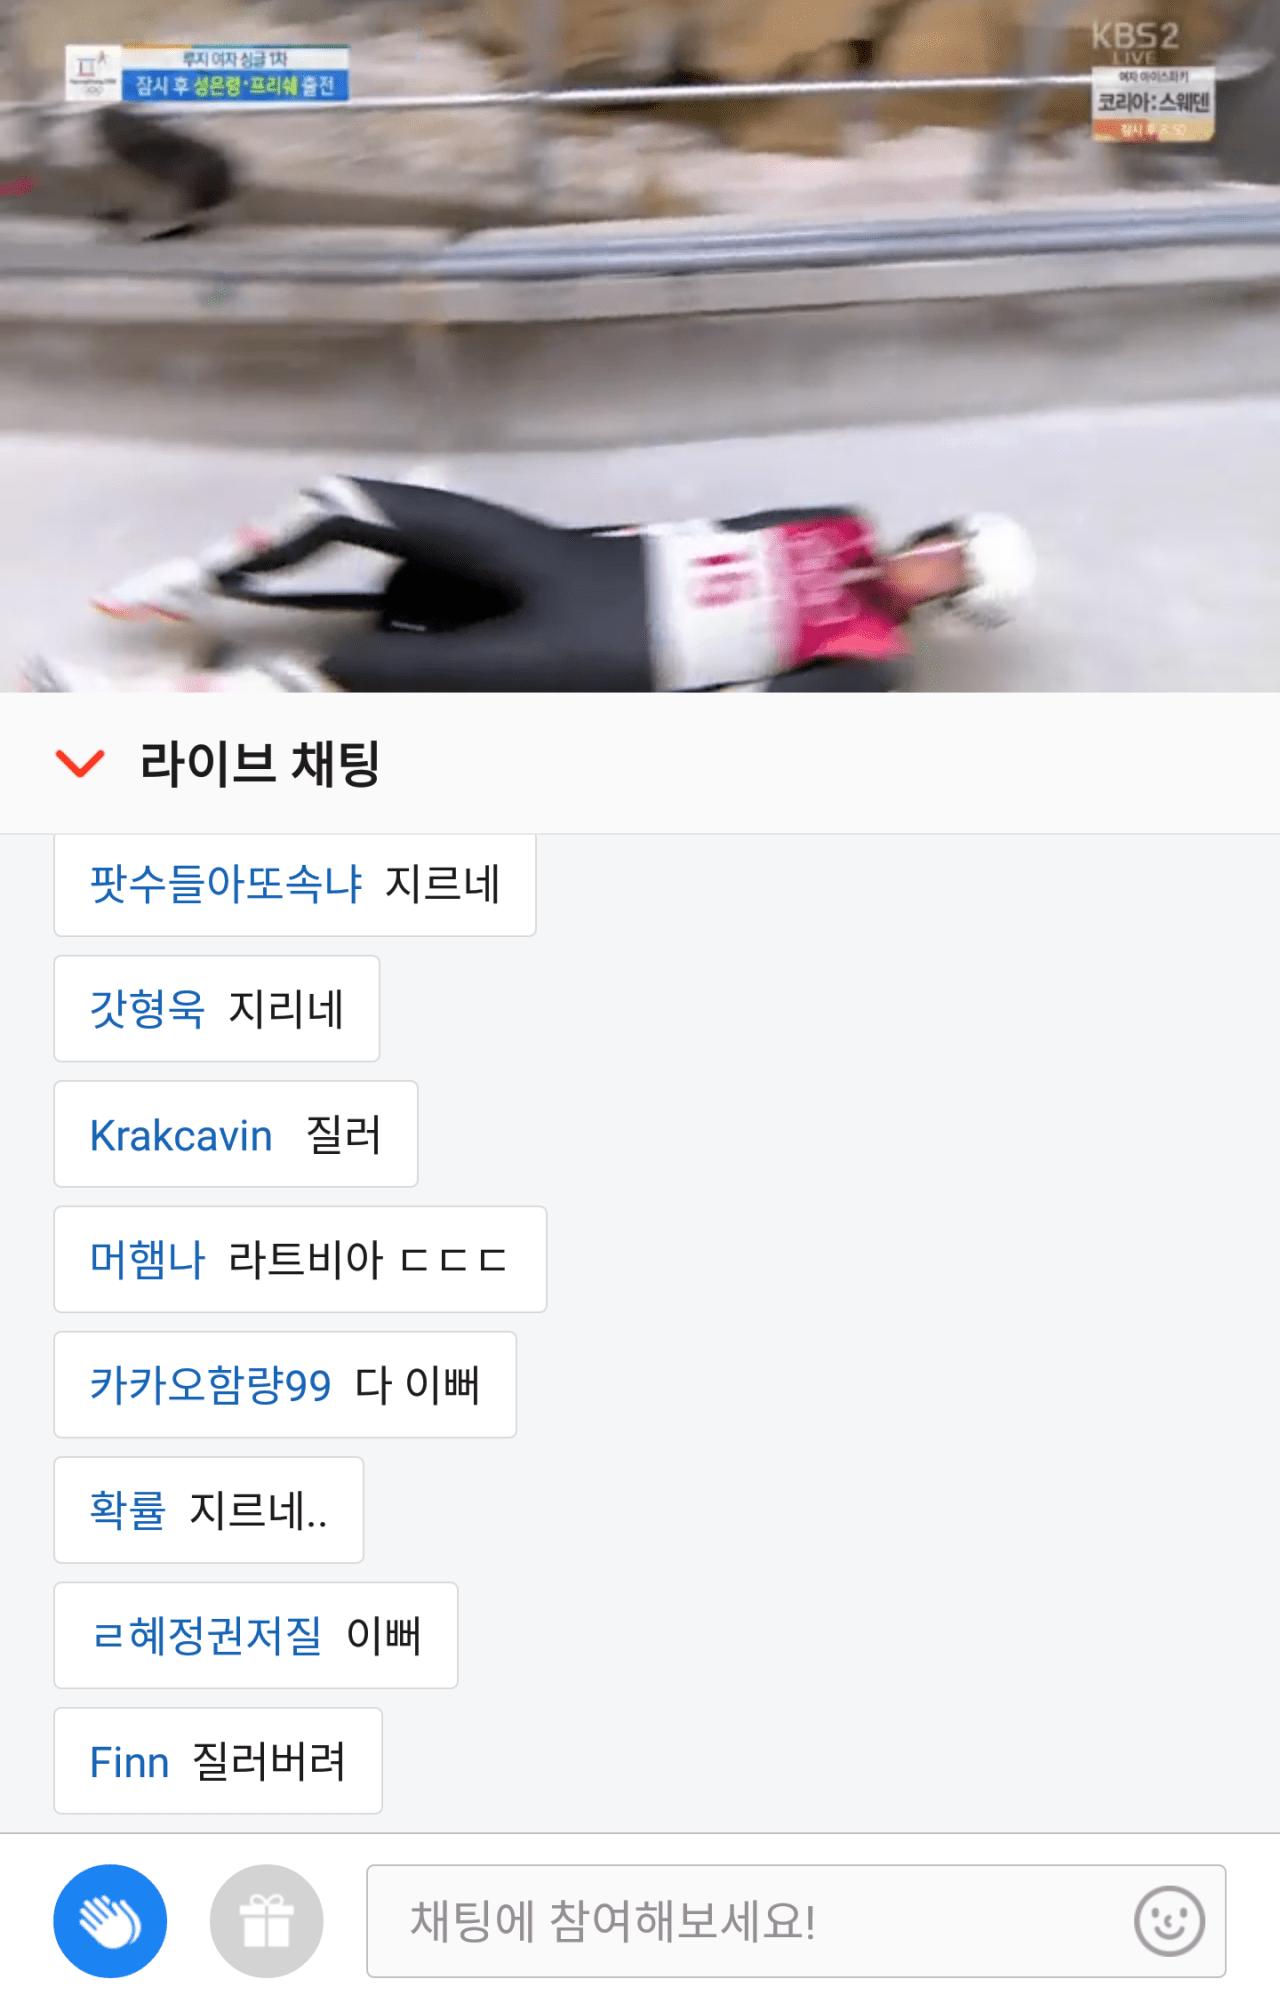 Screenshot_2018-02-12-20-20-23-1.png 현재 평창올림픽 실황ㅗㅜㅑ(feat.팟수).JPG